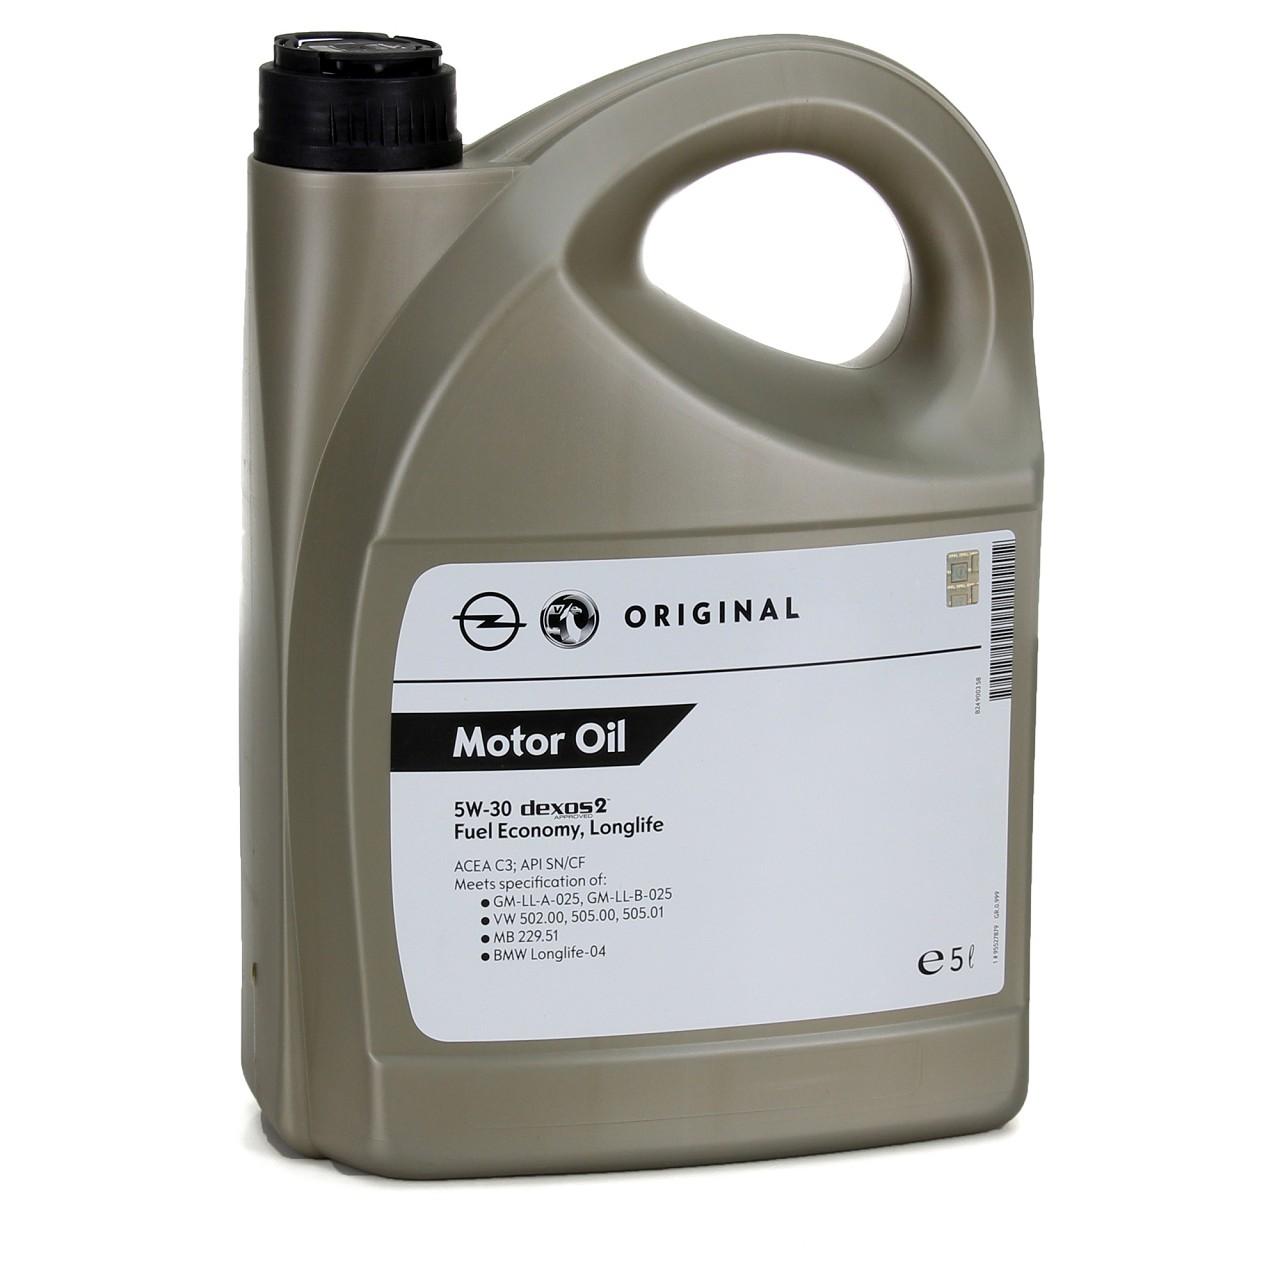 ORIGINAL GM Opel Motoröl ÖL 5W30 dexos2 Fuel Economy Longlife 5 Liter 95527879